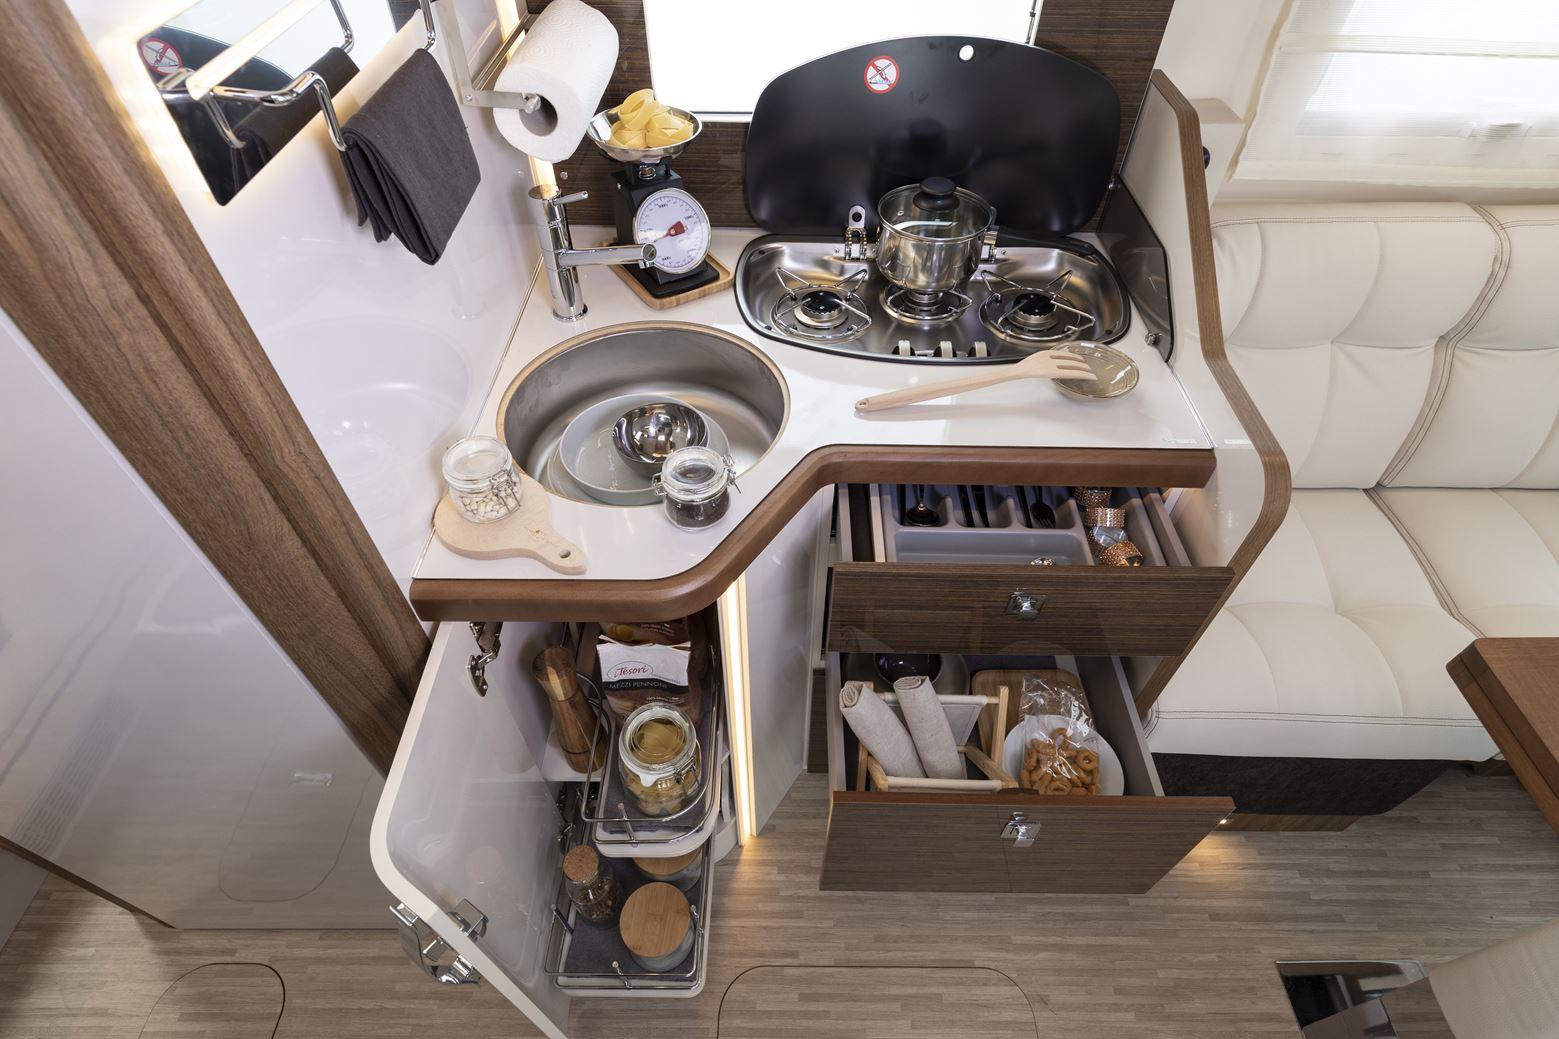 Ergonomicky tvarobaná kuchyňa